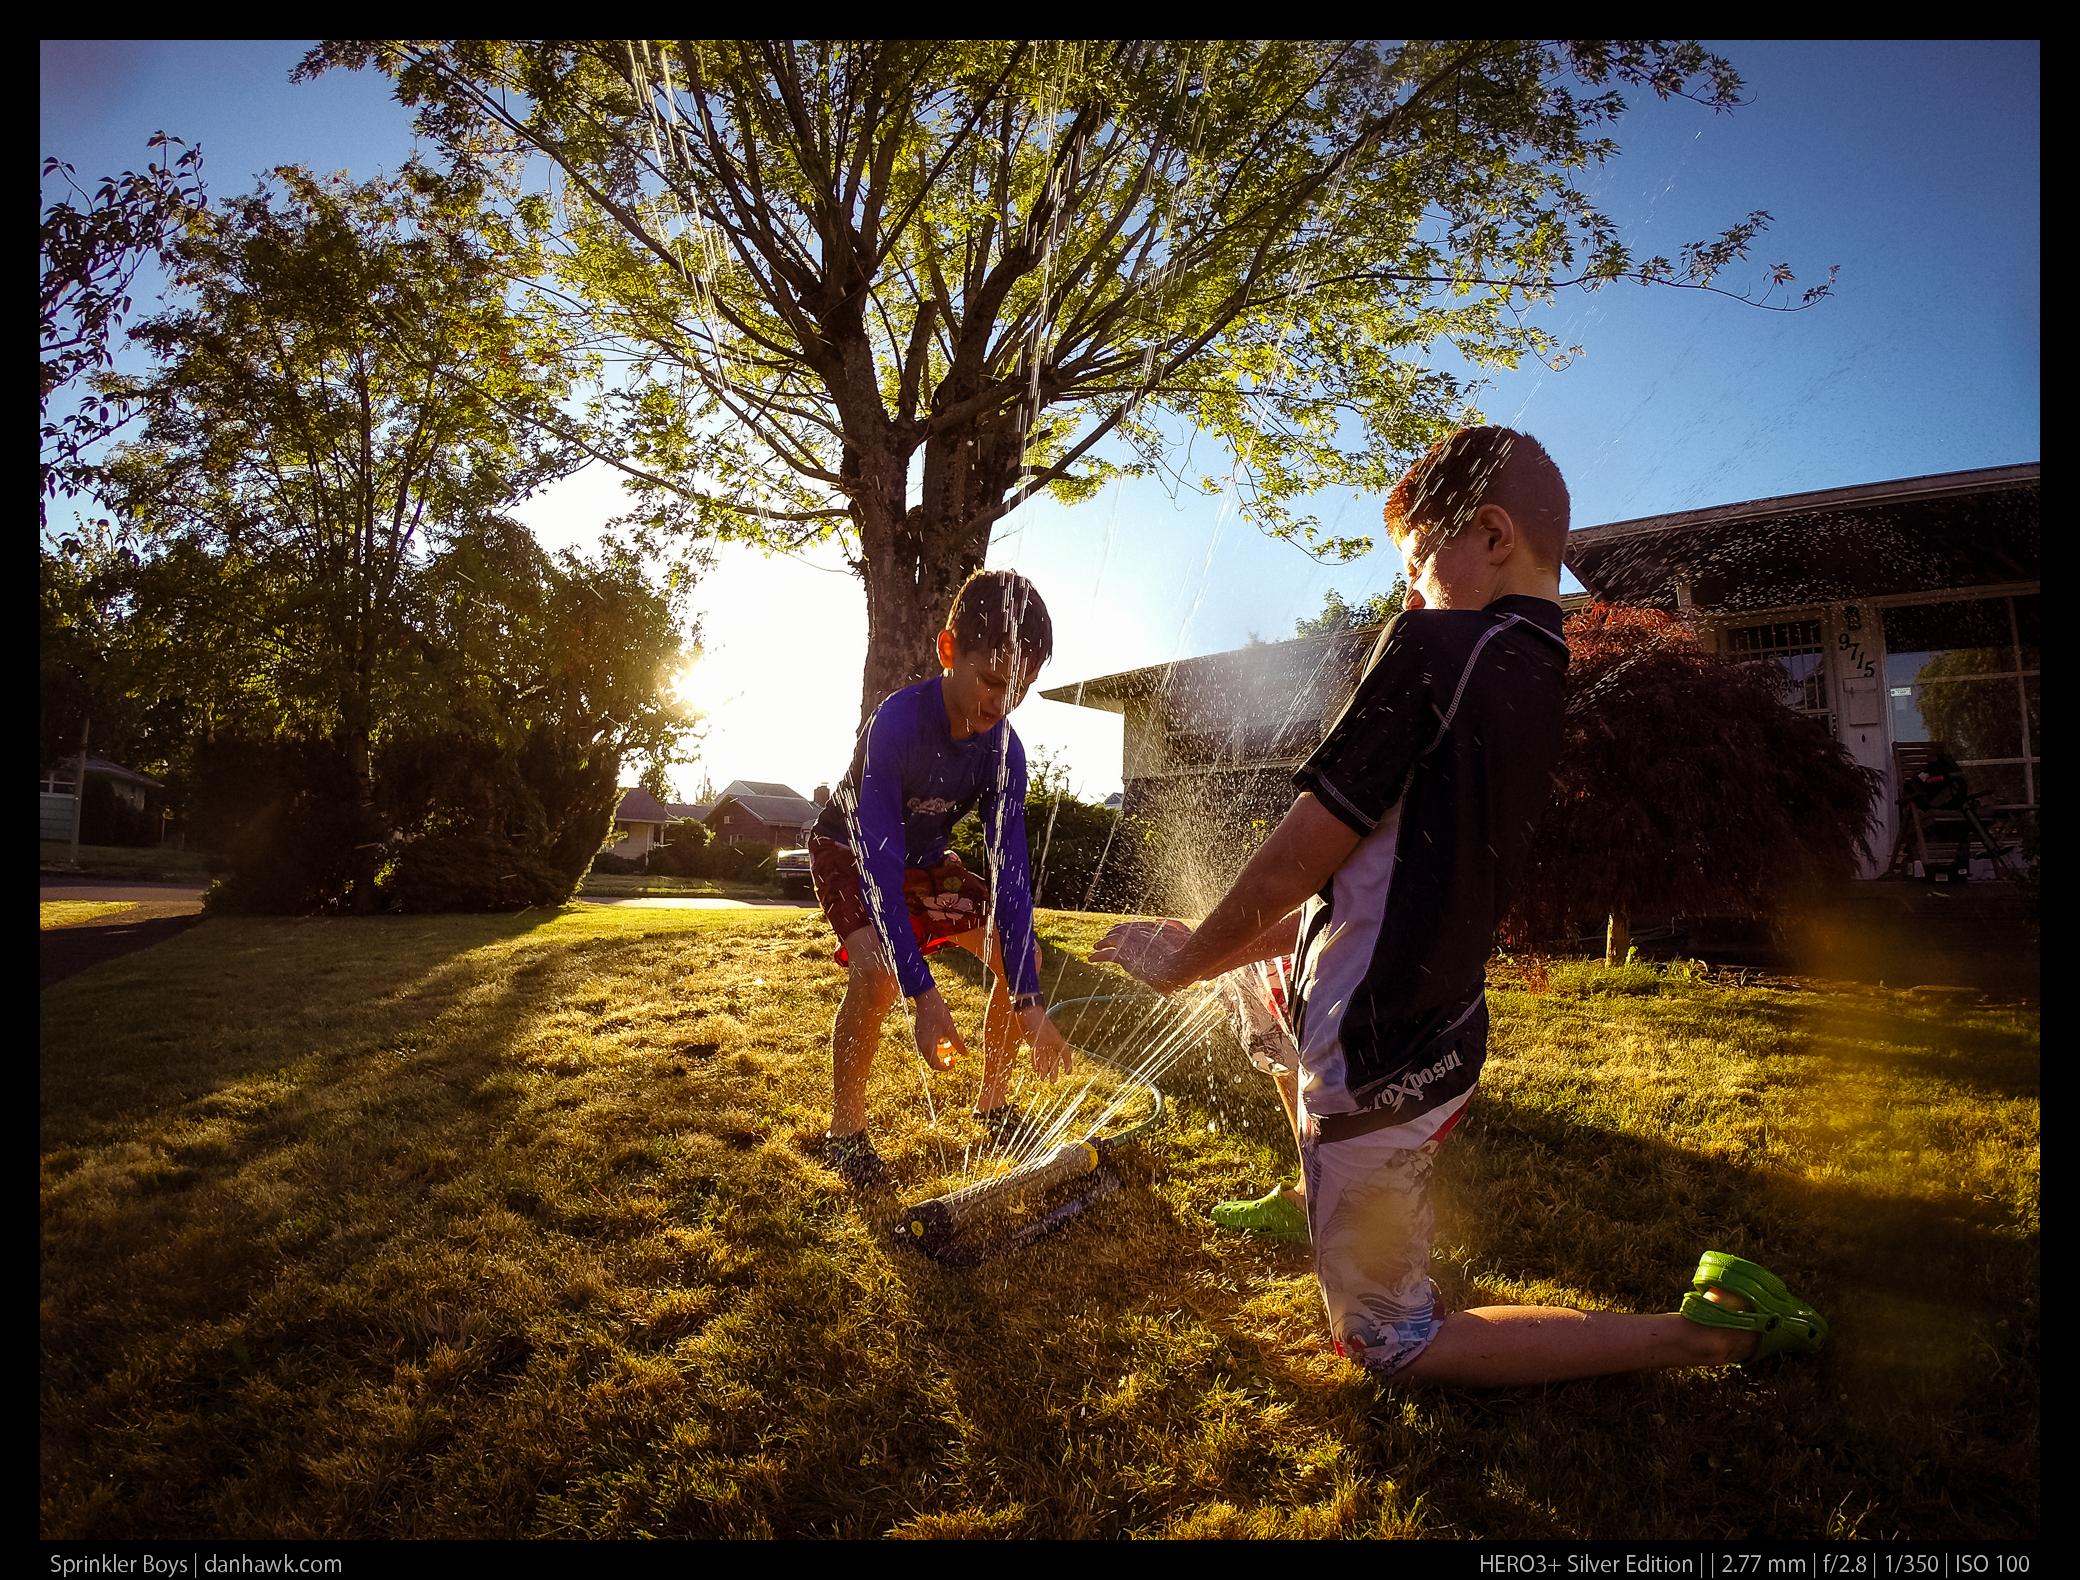 Sprinkler Boys